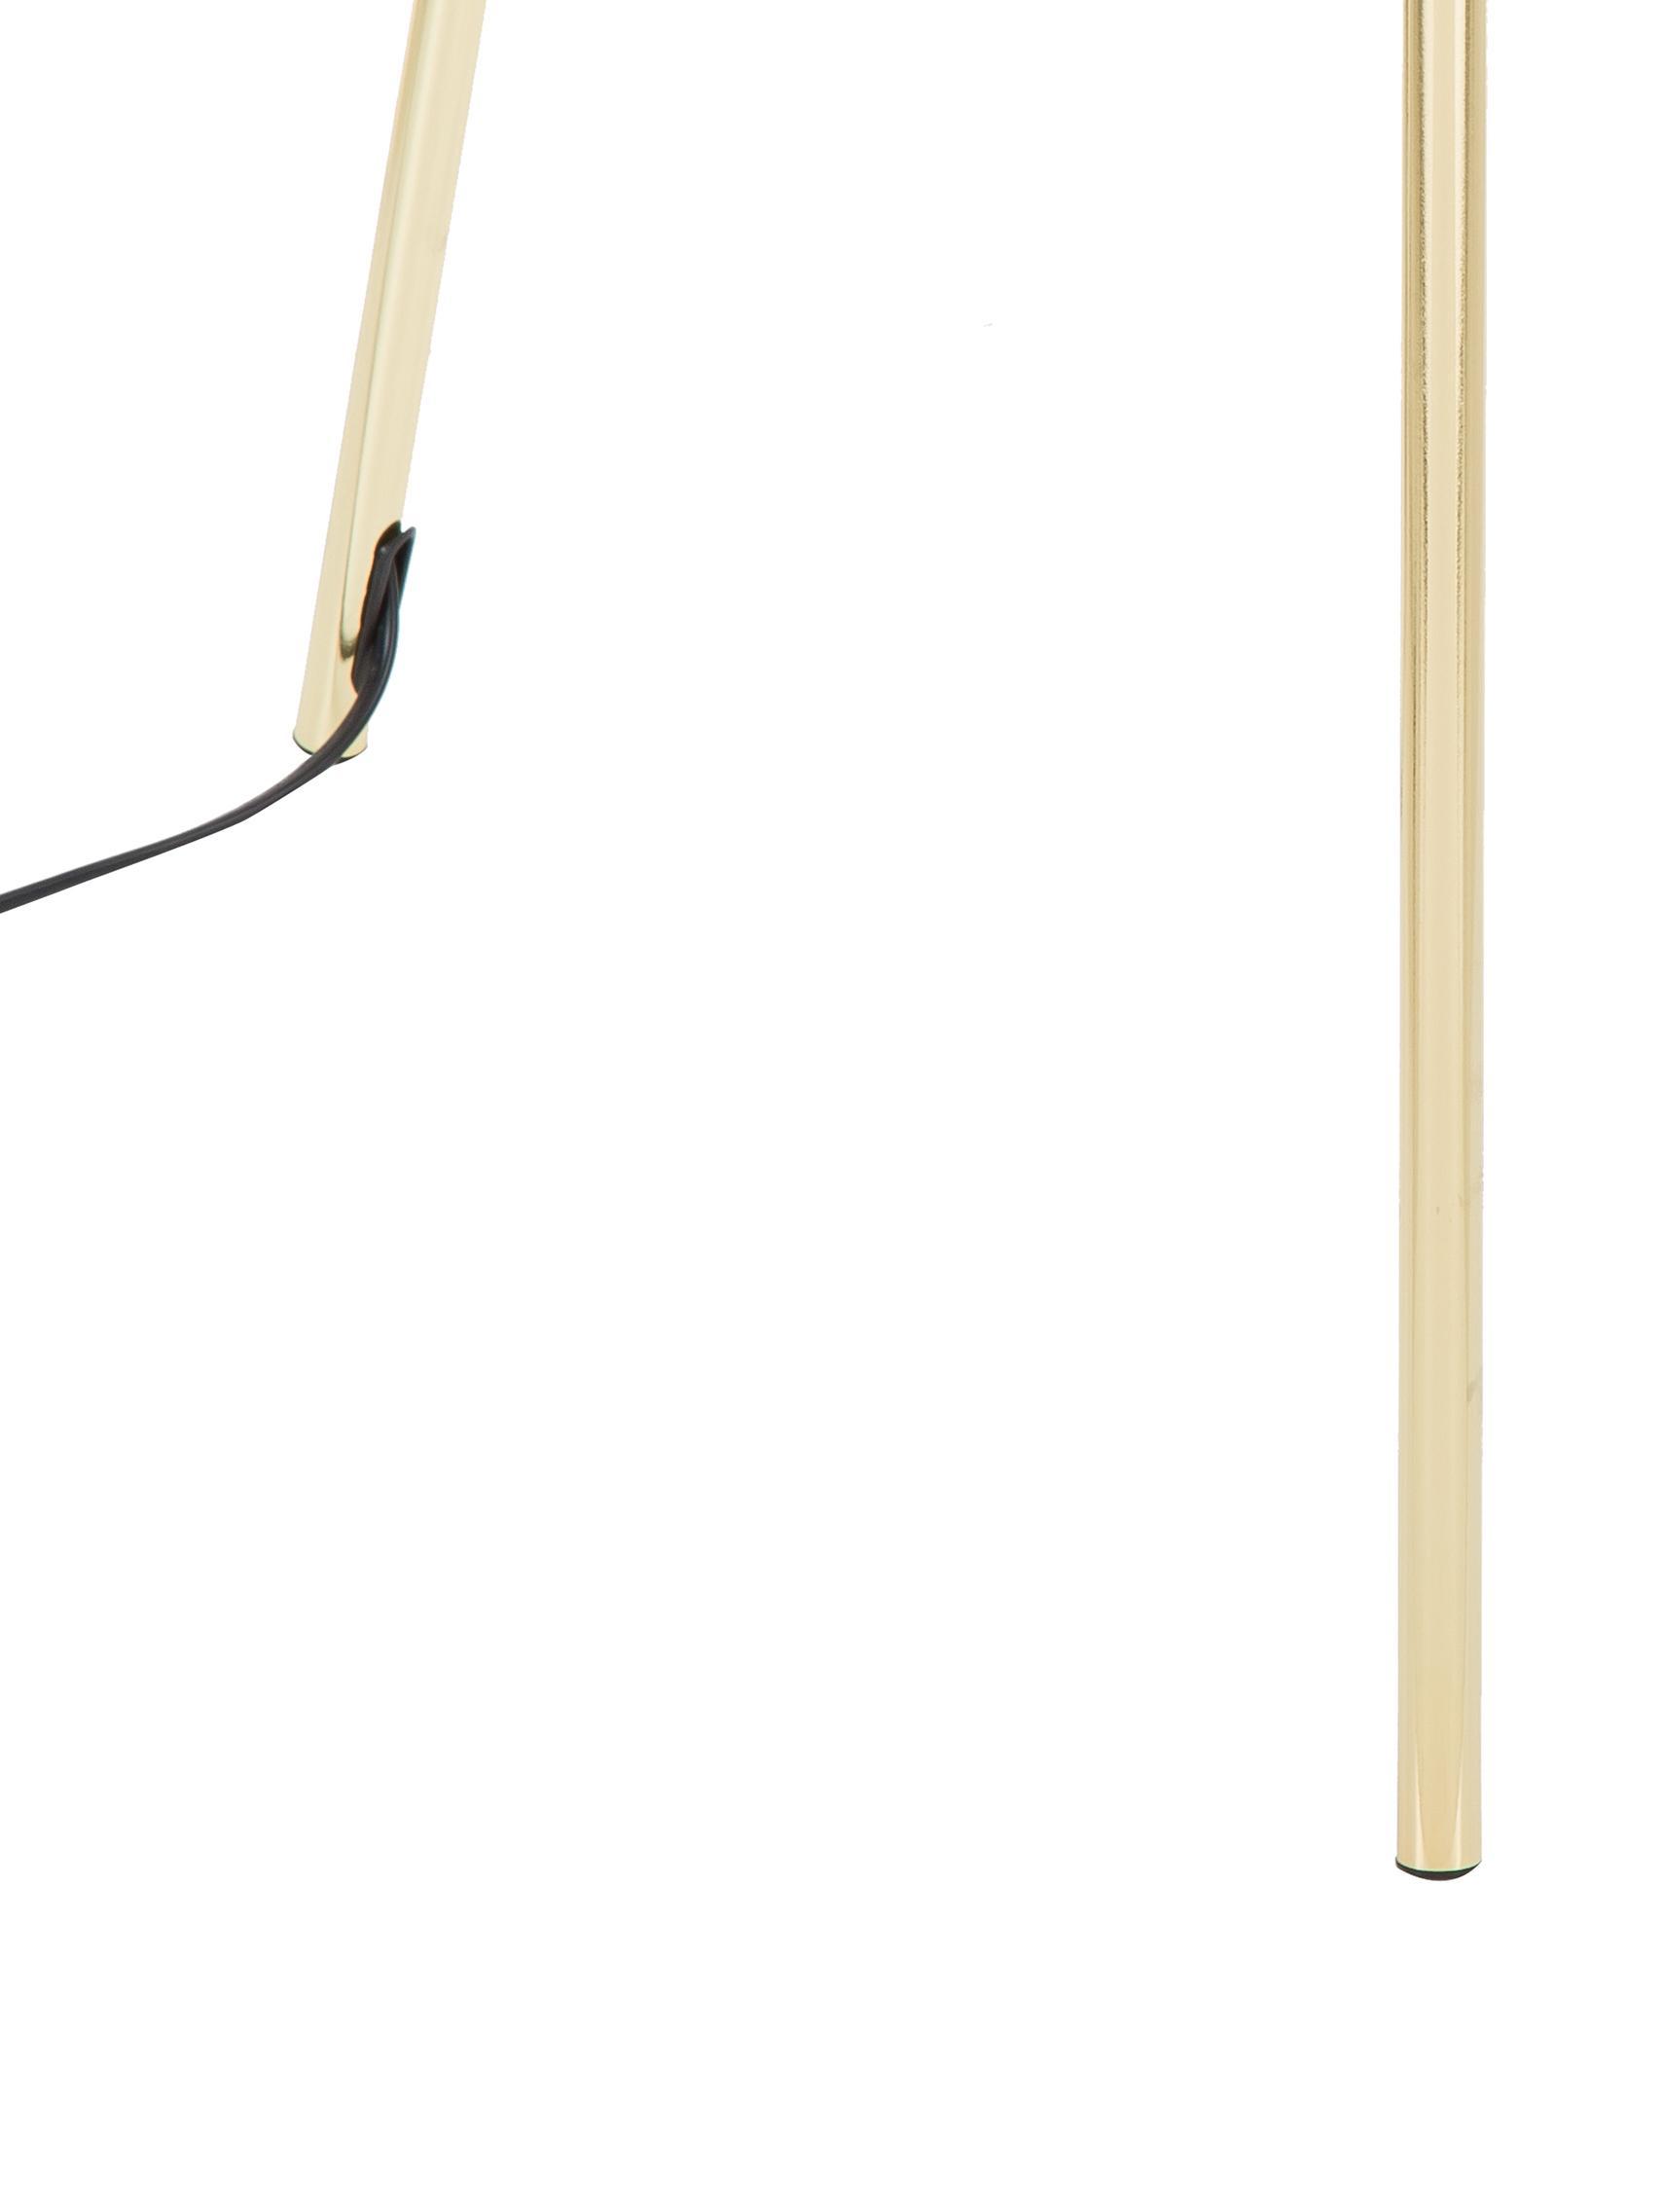 Vloerlamp Cella, Lampenkap: katoen, Lampvoet: metaal, Zwart, goudkleurig, Ø 45 x H 148 cm